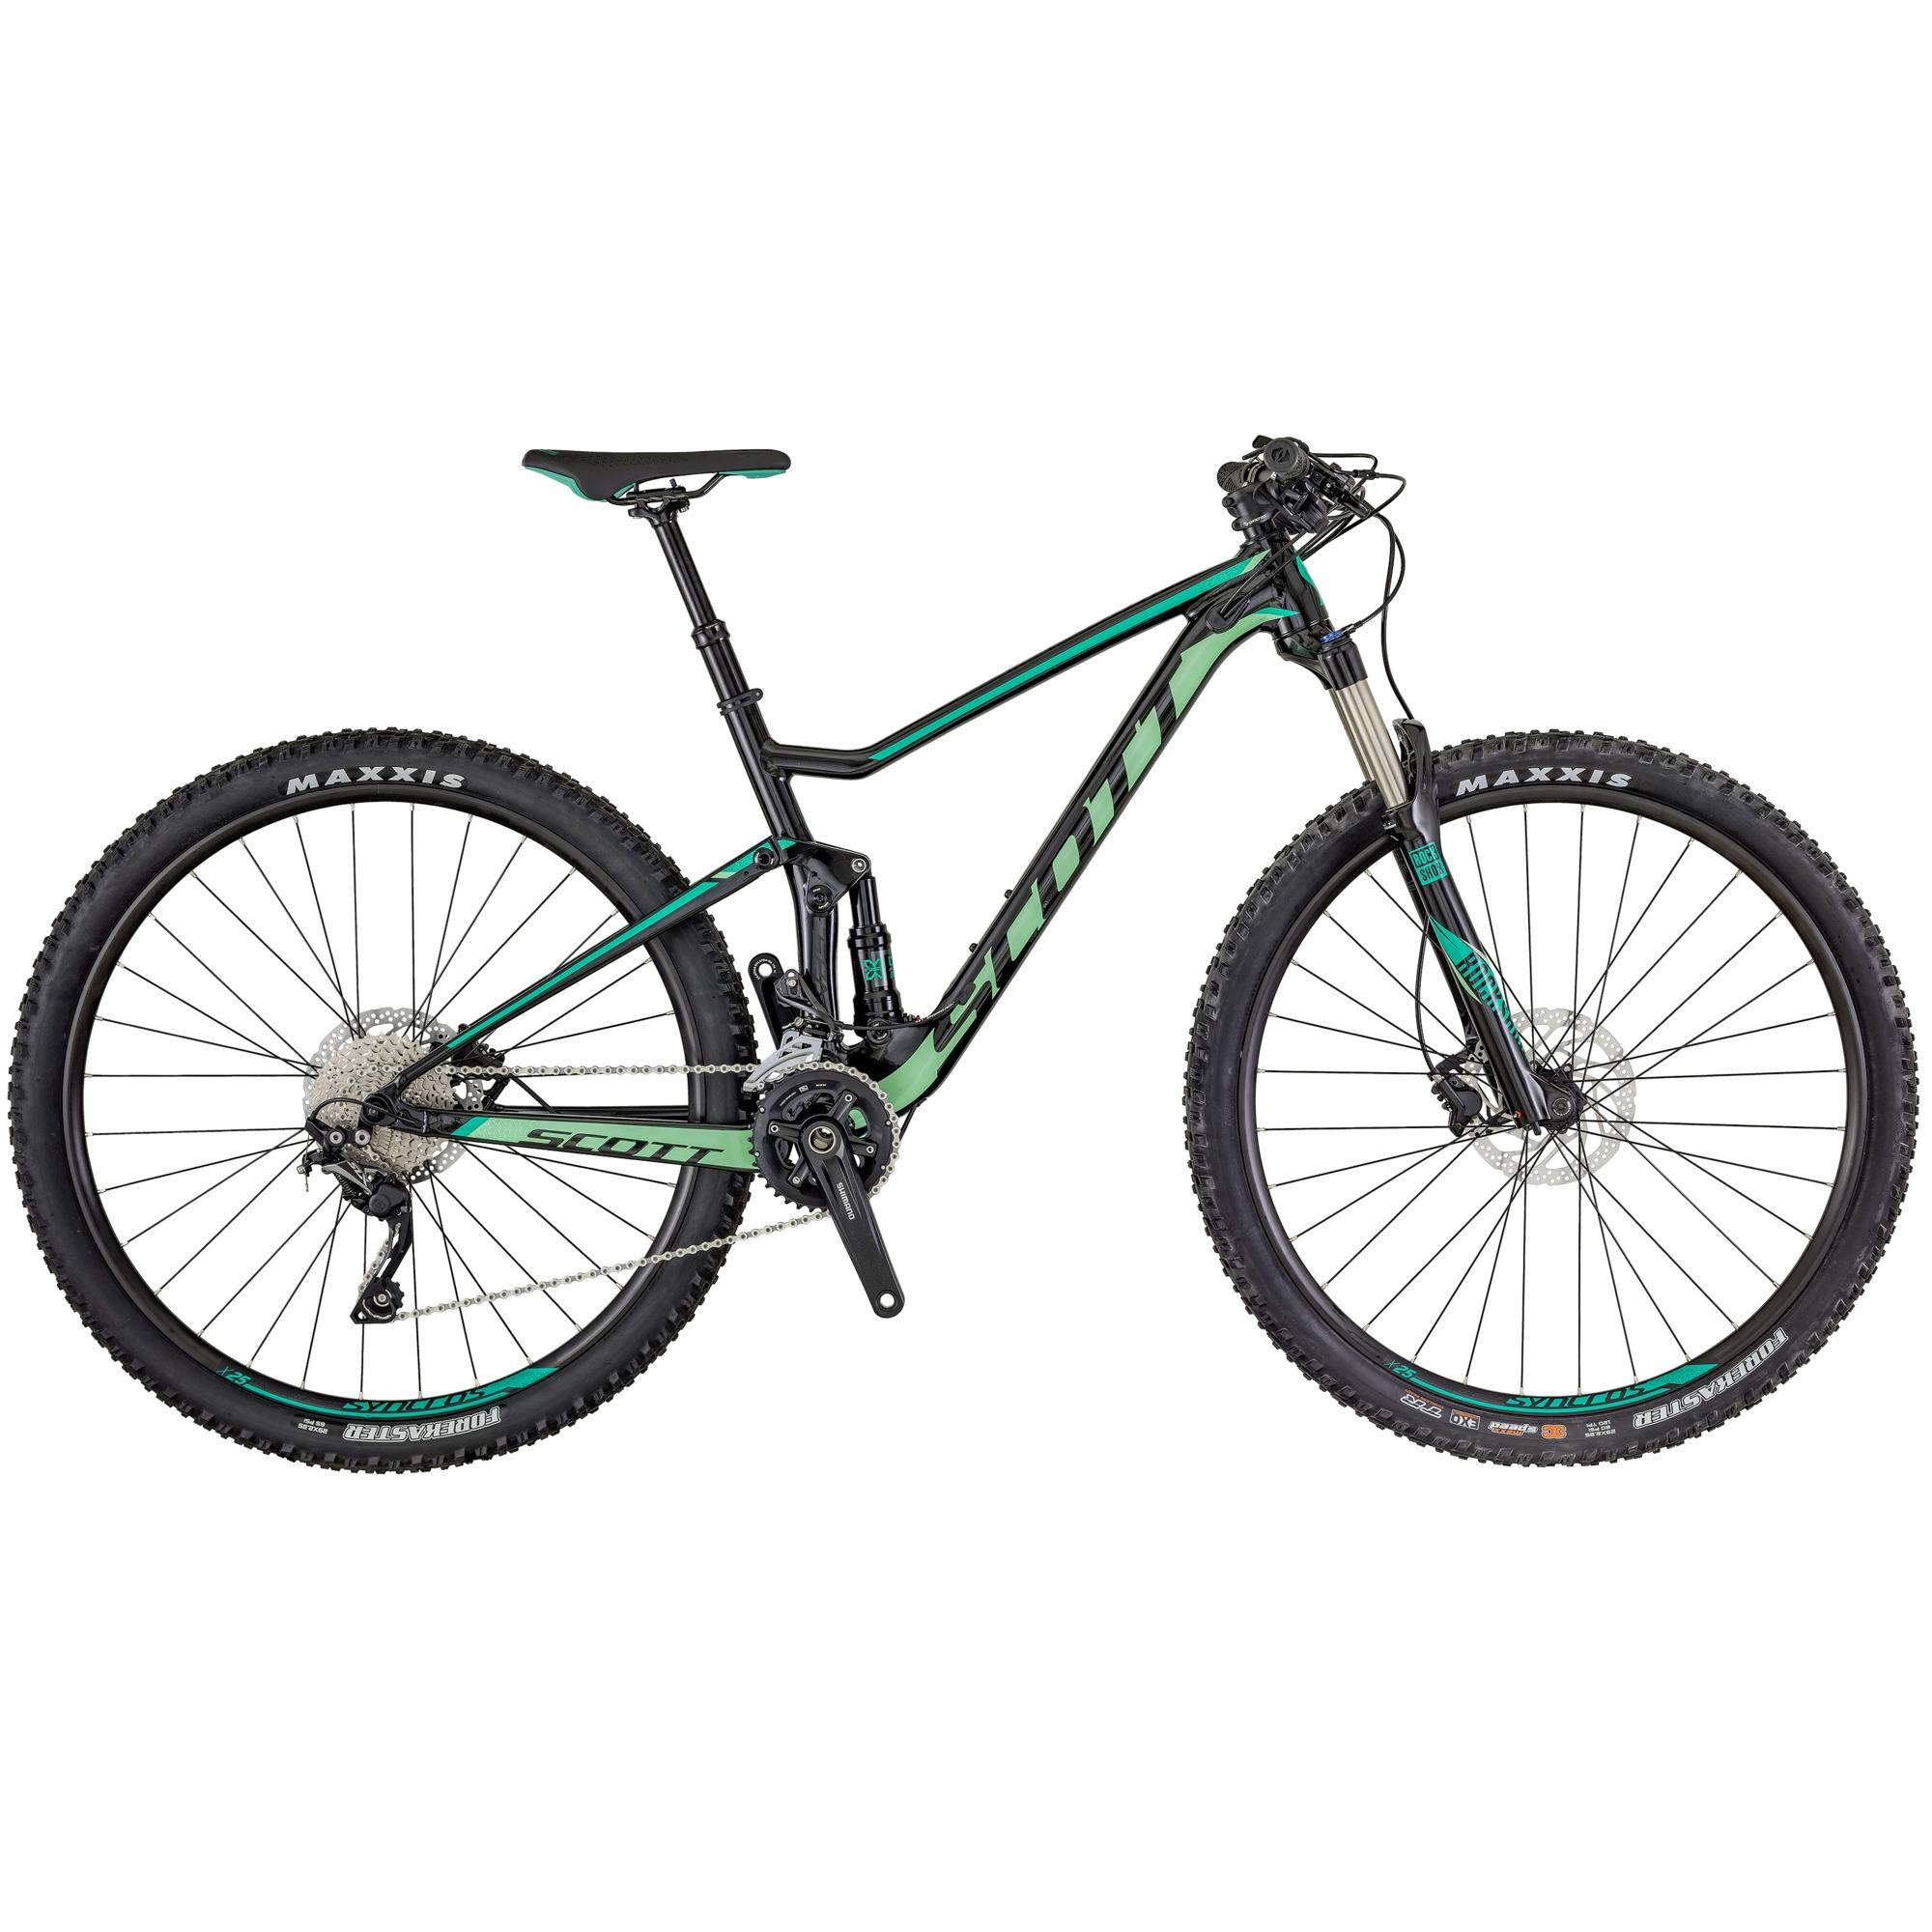 SCOTT Contessa Spark 930 Bike M - Rad & Dämpferklinik GmbH